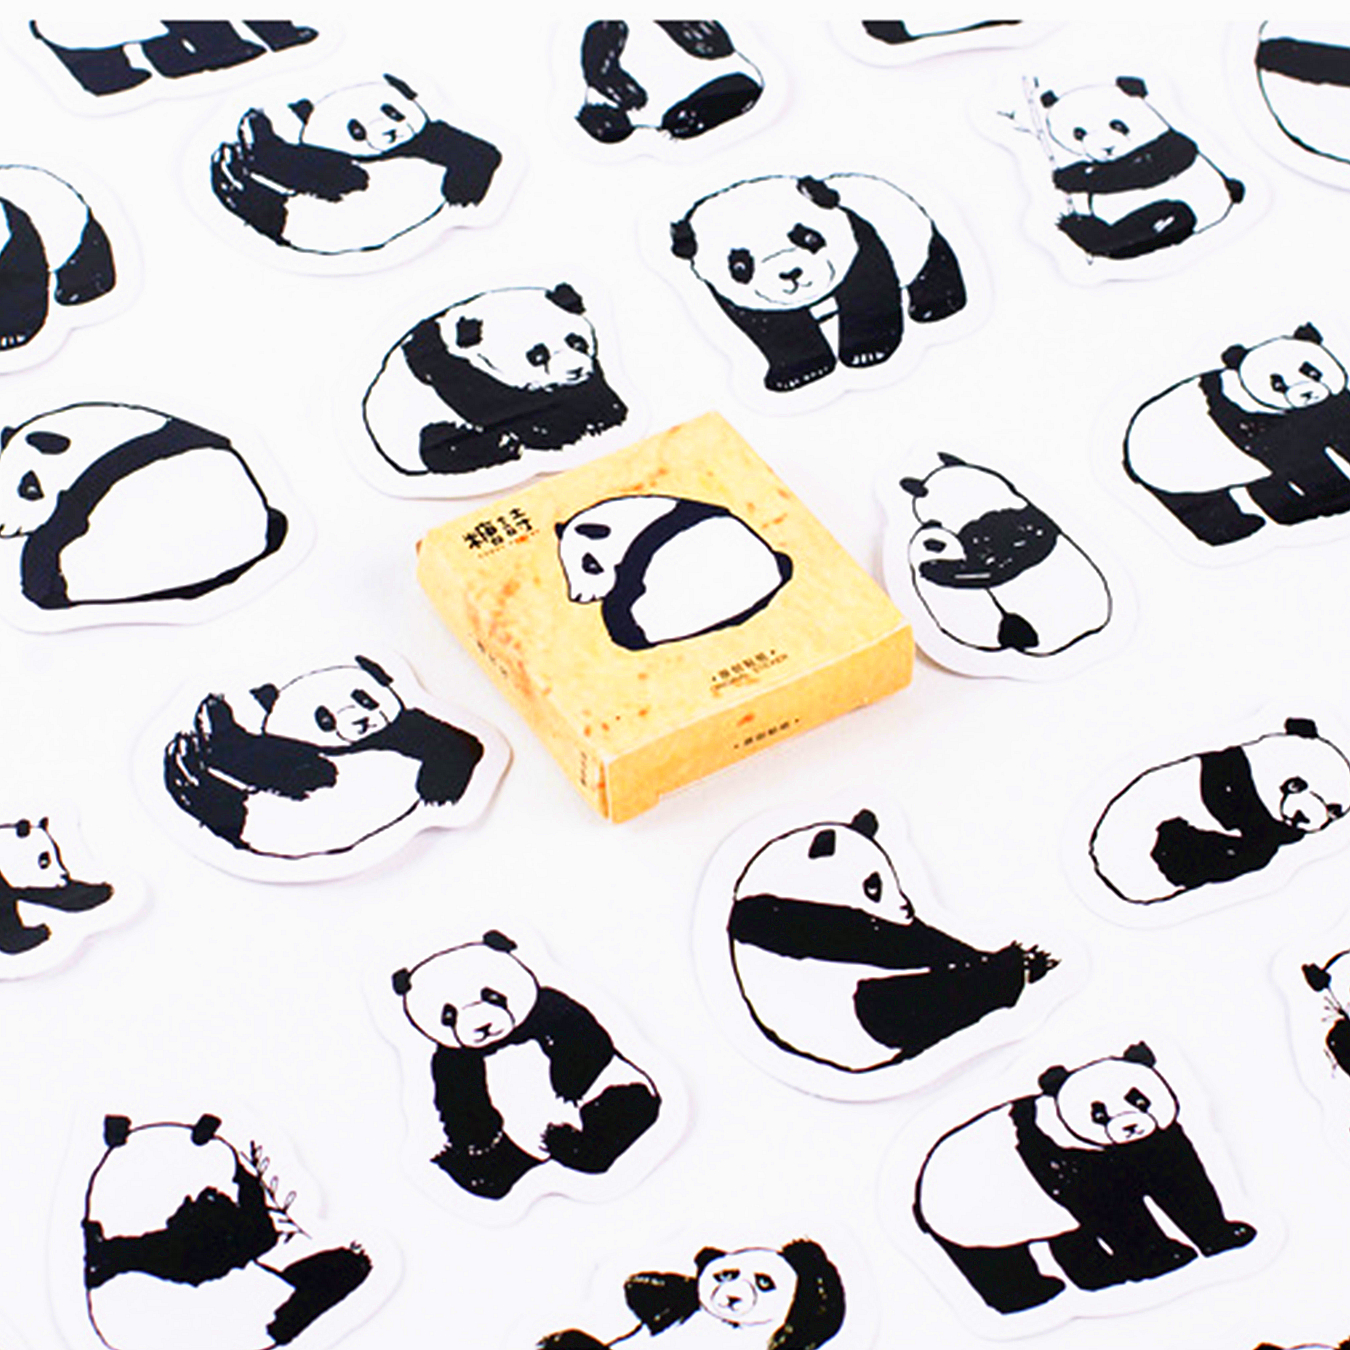 Memo Pads Trend Mark 1pcs 2019 Treasure Panda Memo Pad Diary Stickers Pack Posted It Kawaii Planner Scrapbooking Stationery Escolar School Supplies